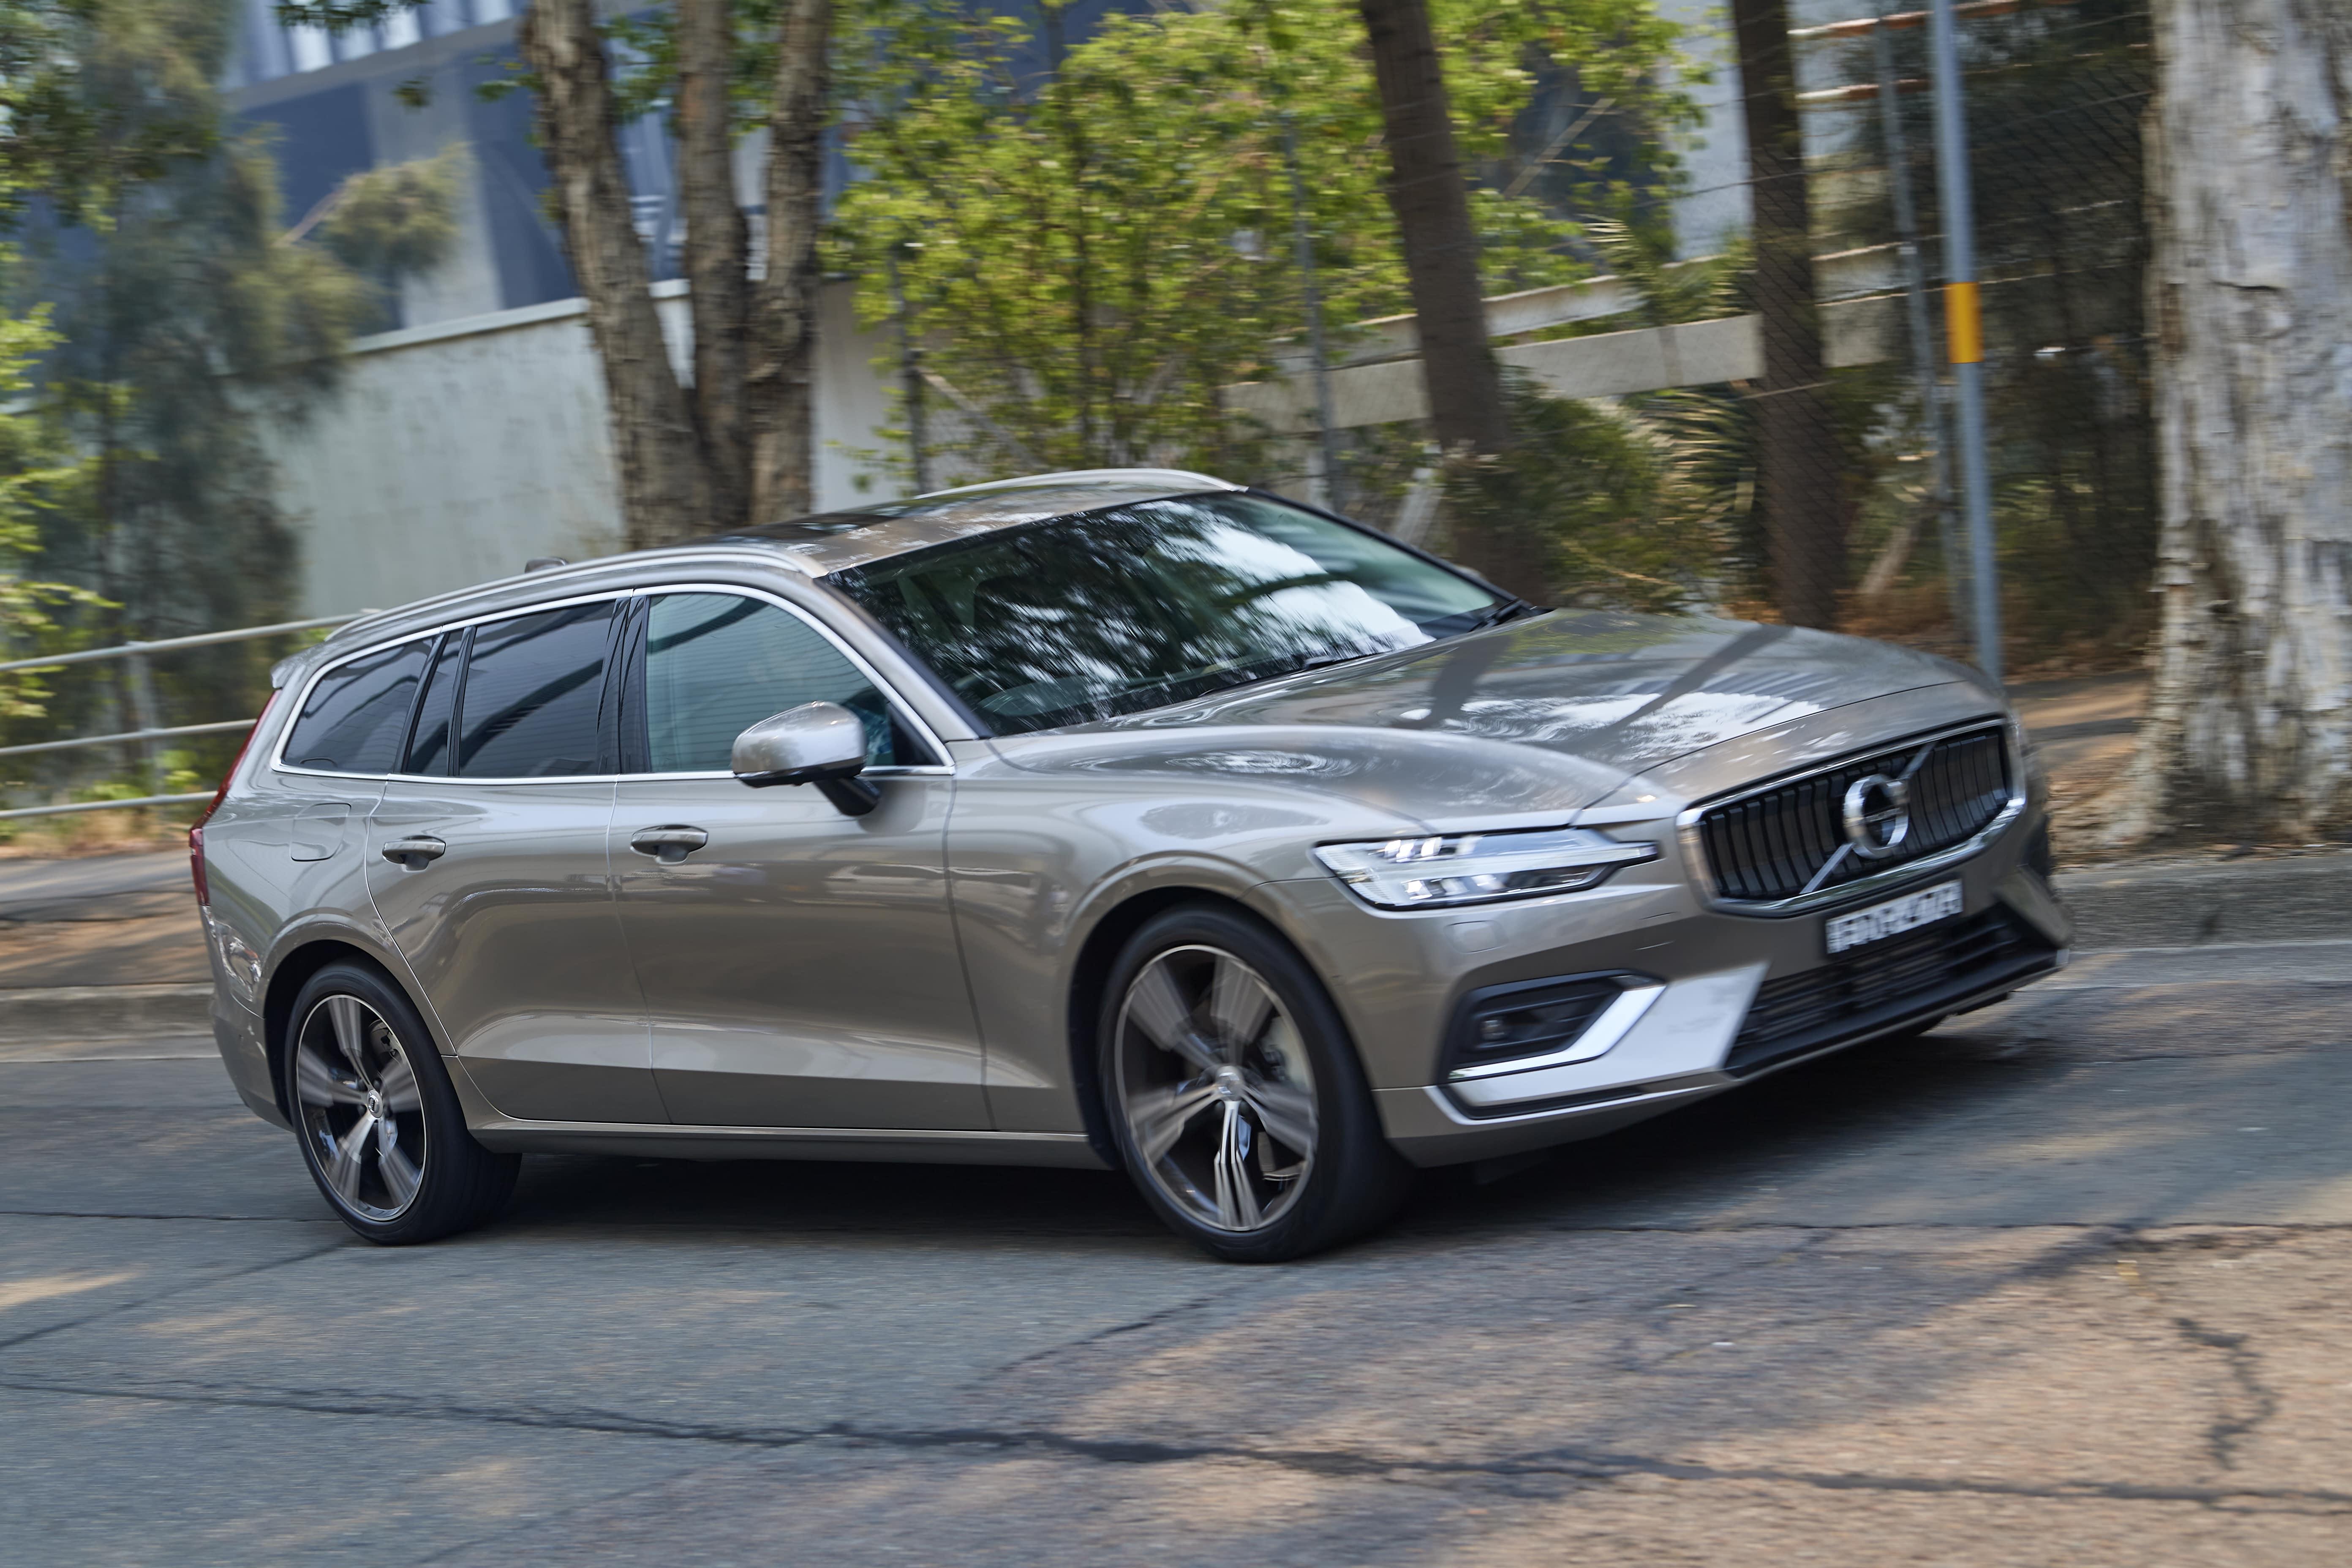 Touring Review: 2020 Volvo V60 T5 Inscription